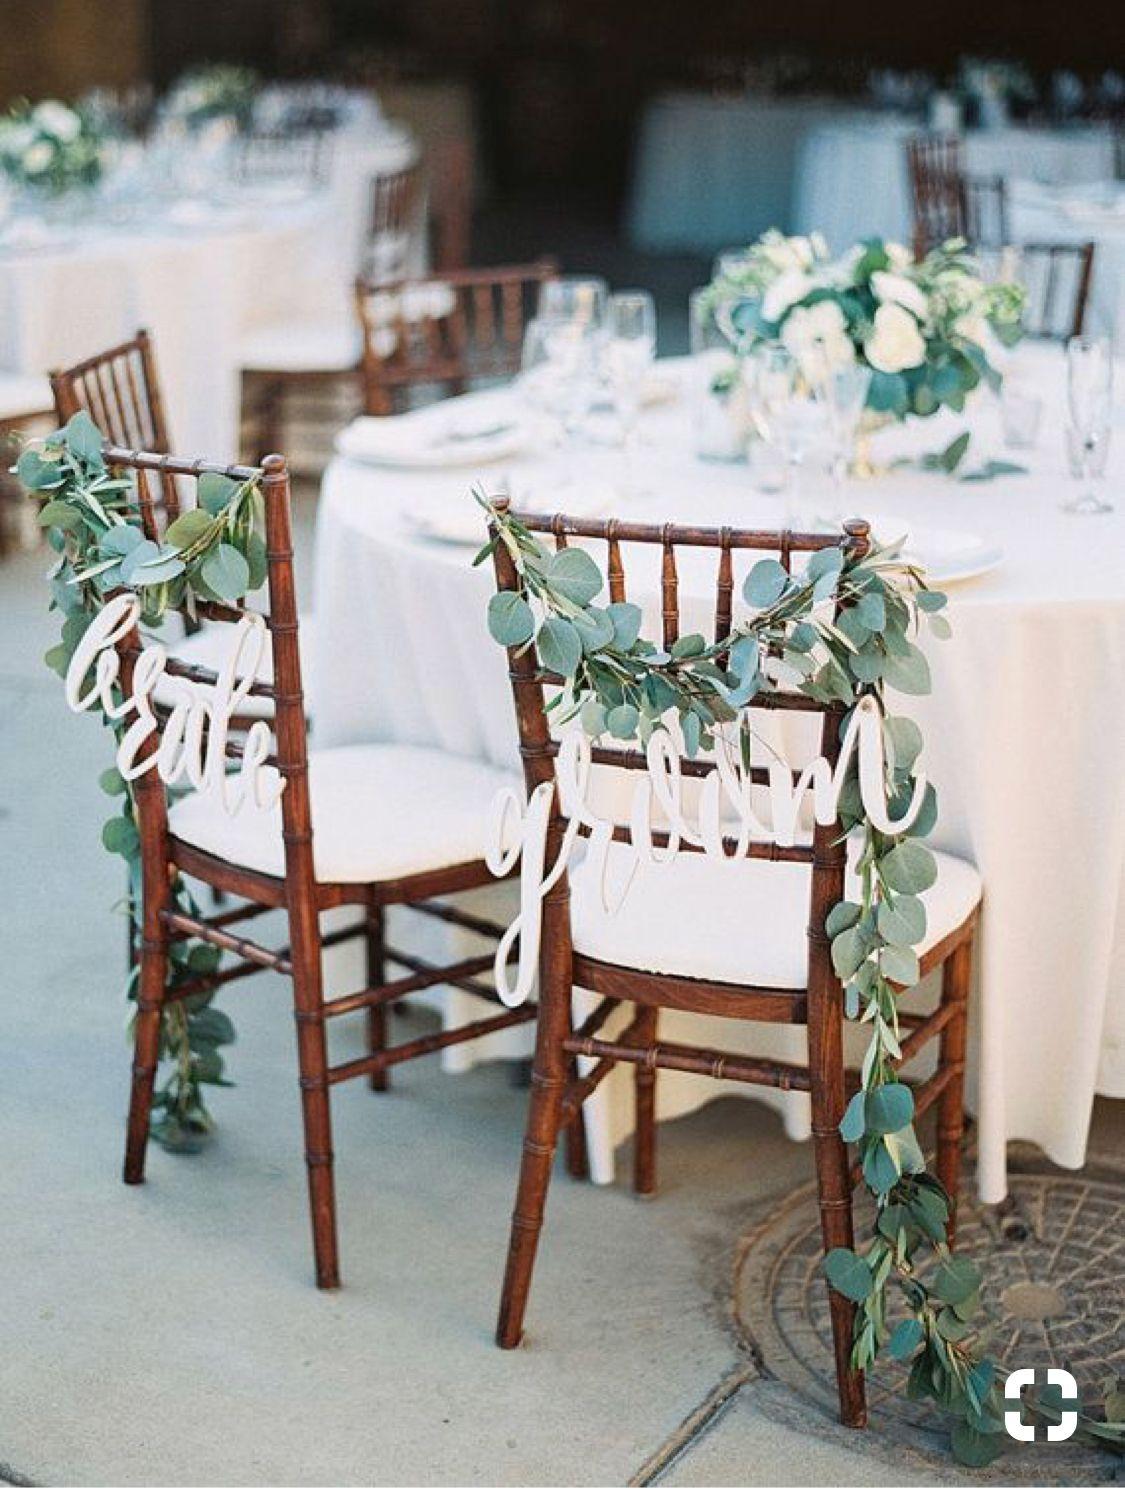 Wedding decorations at church november 2018 Pin by ola on Ślub in   Pinterest  Wedding Wedding